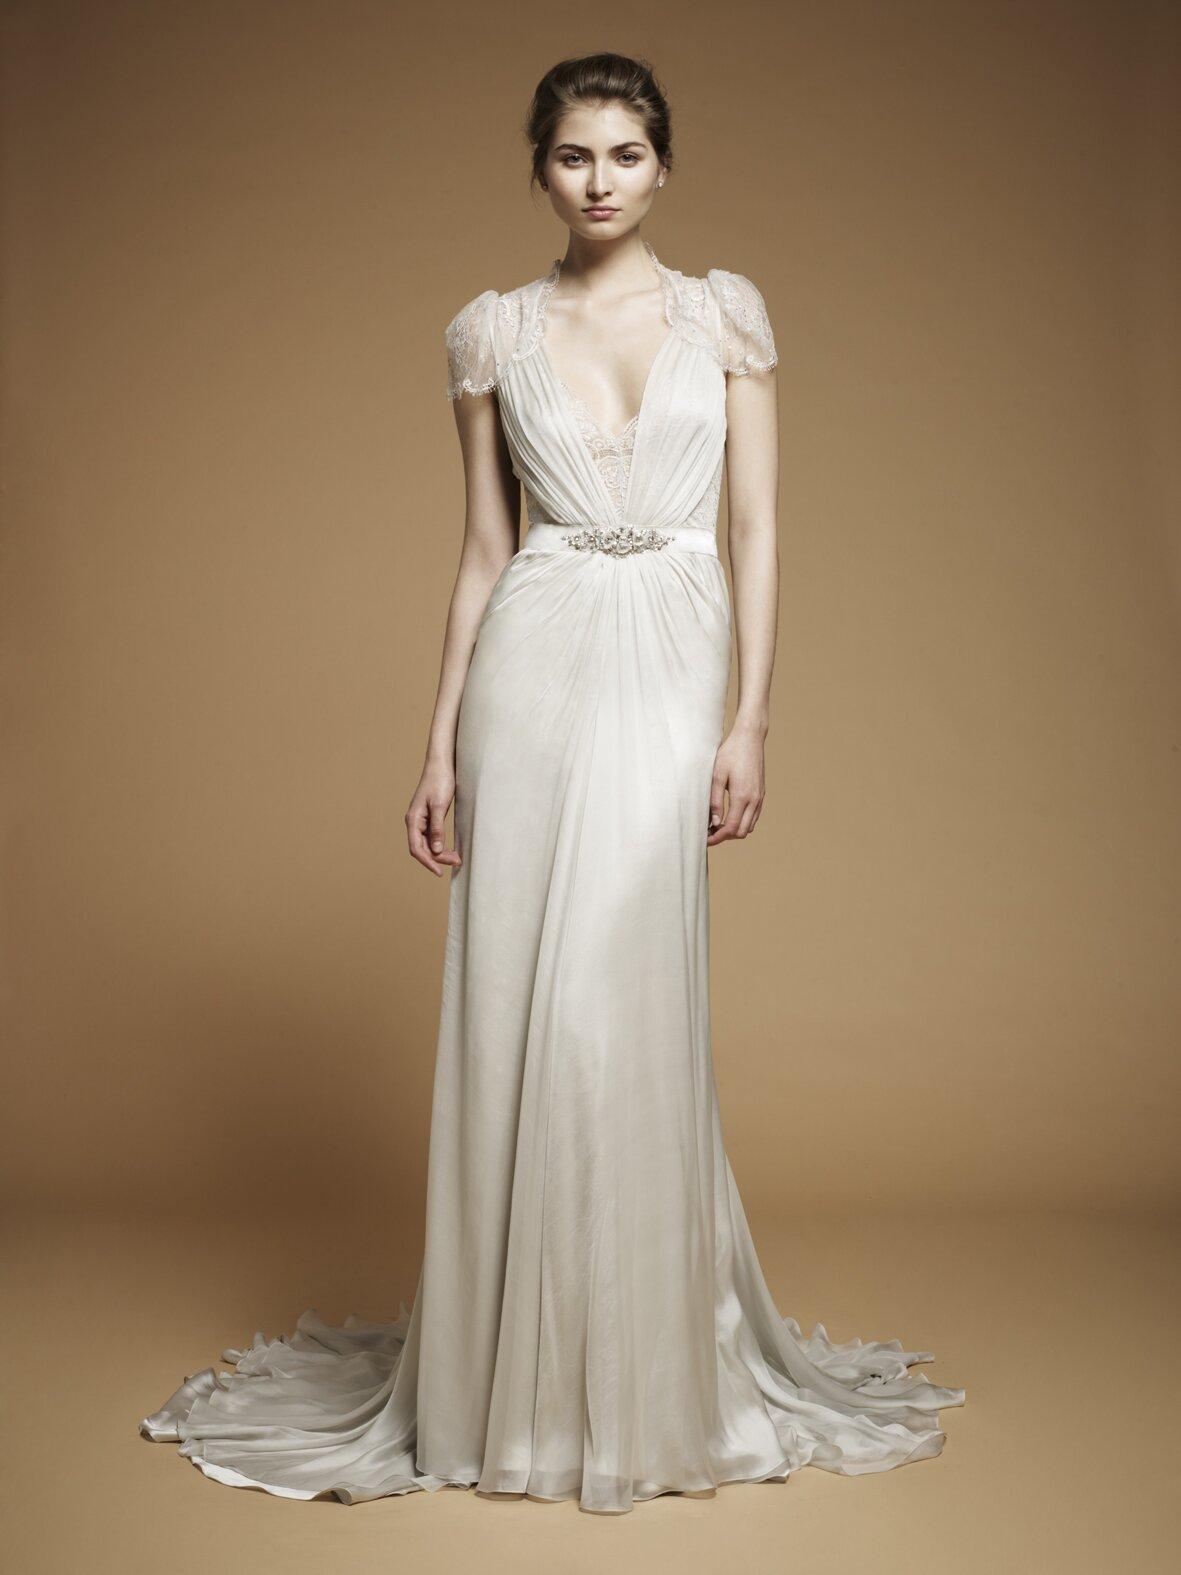 Wedding Dress Jenny Packham Wedding Dresses For Sale jenny packham wedding dresses browse pictures and high quality photo 2